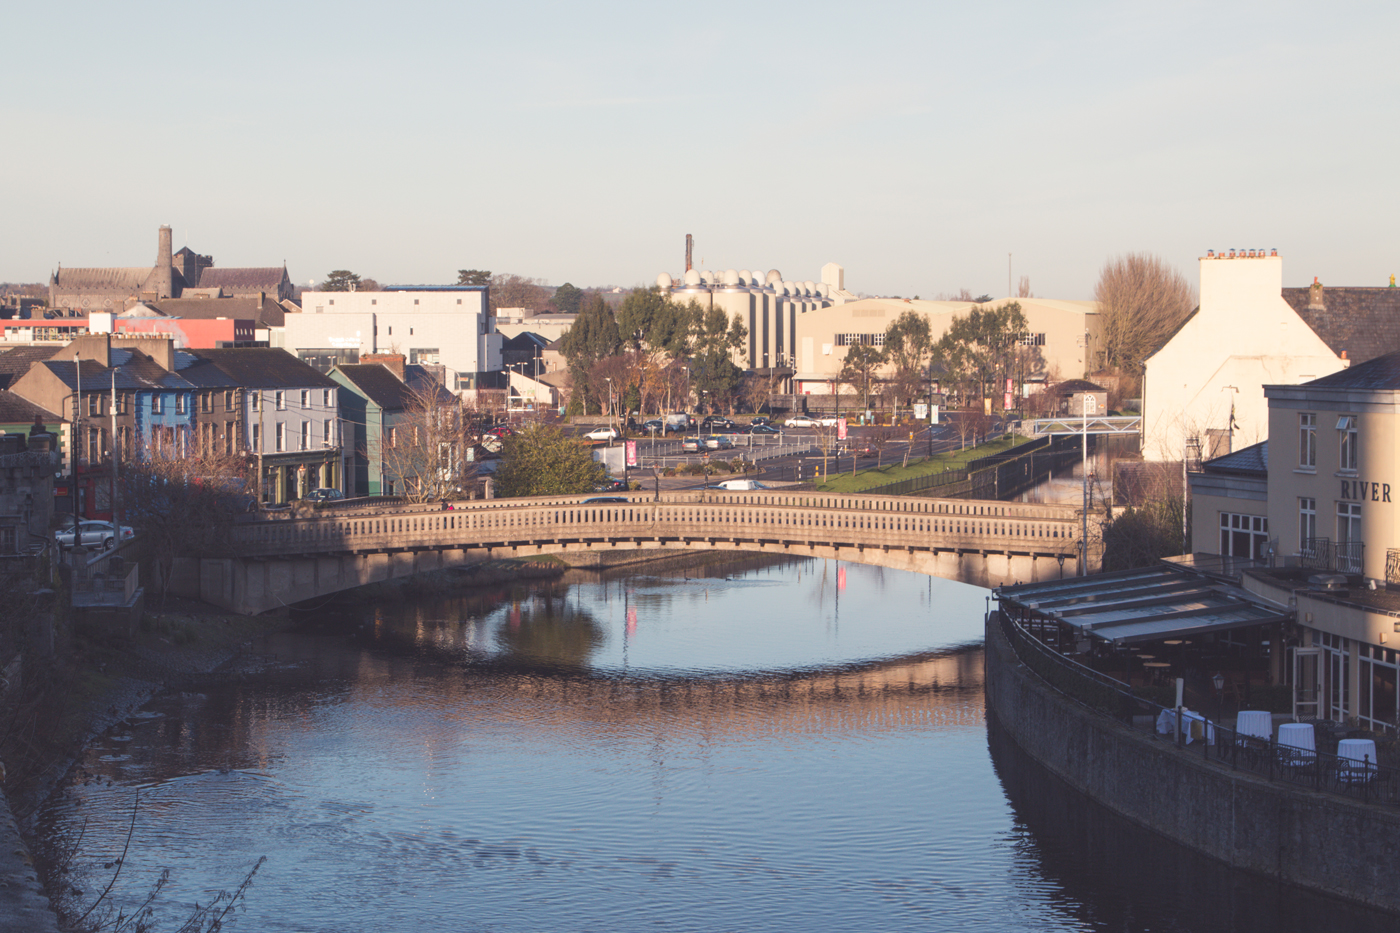 Town of Kilkenny